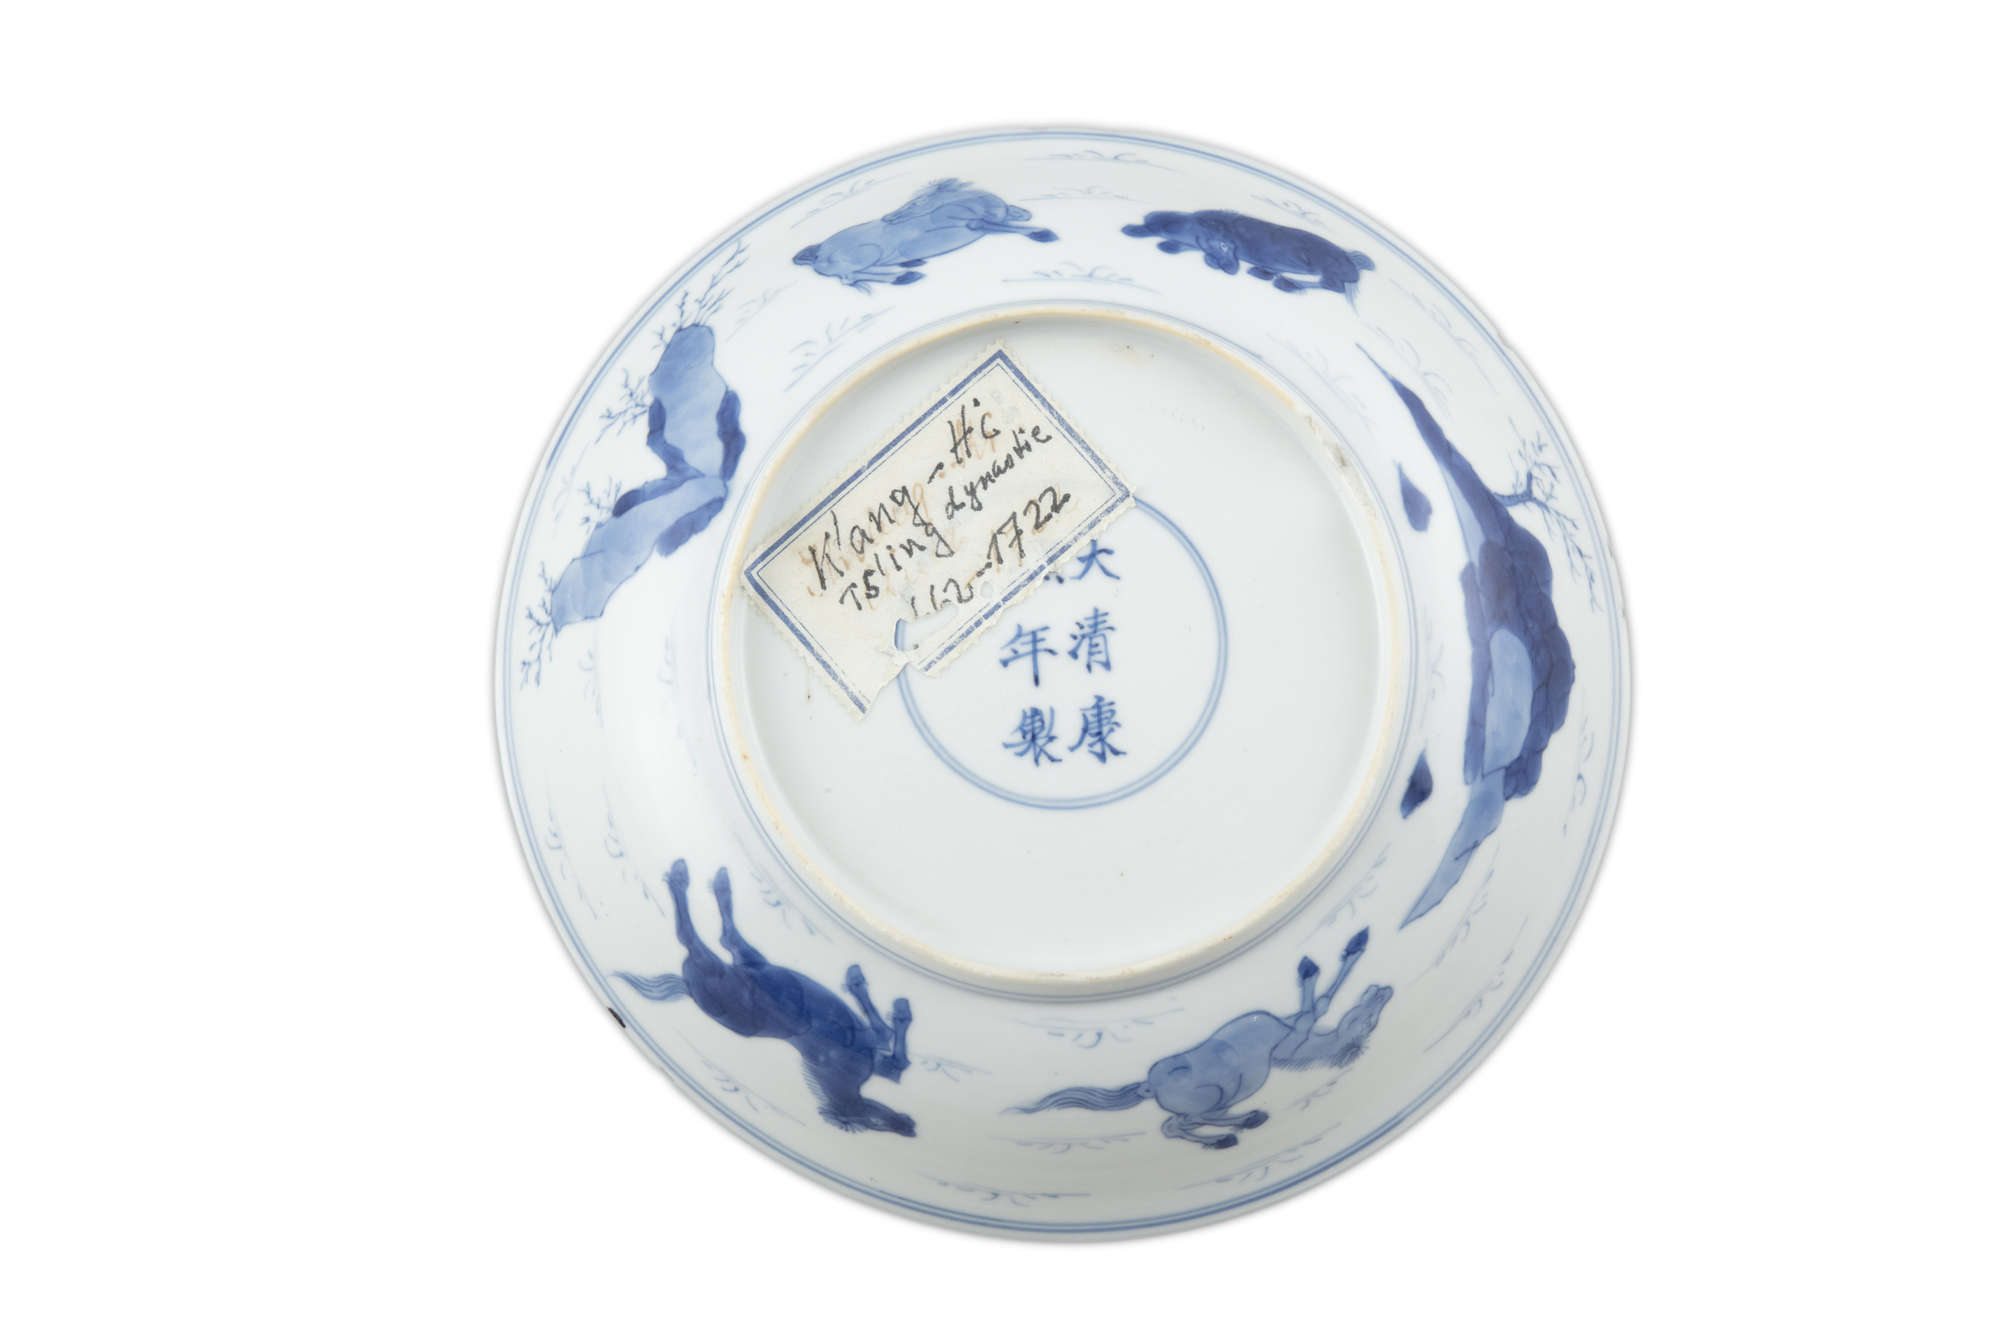 A BLUE AND WHITE 'EIGHT HORSES OF WANG MU' PORCELAIN DISH China, Qing Dynasty, Kangxi mark and - Image 3 of 17